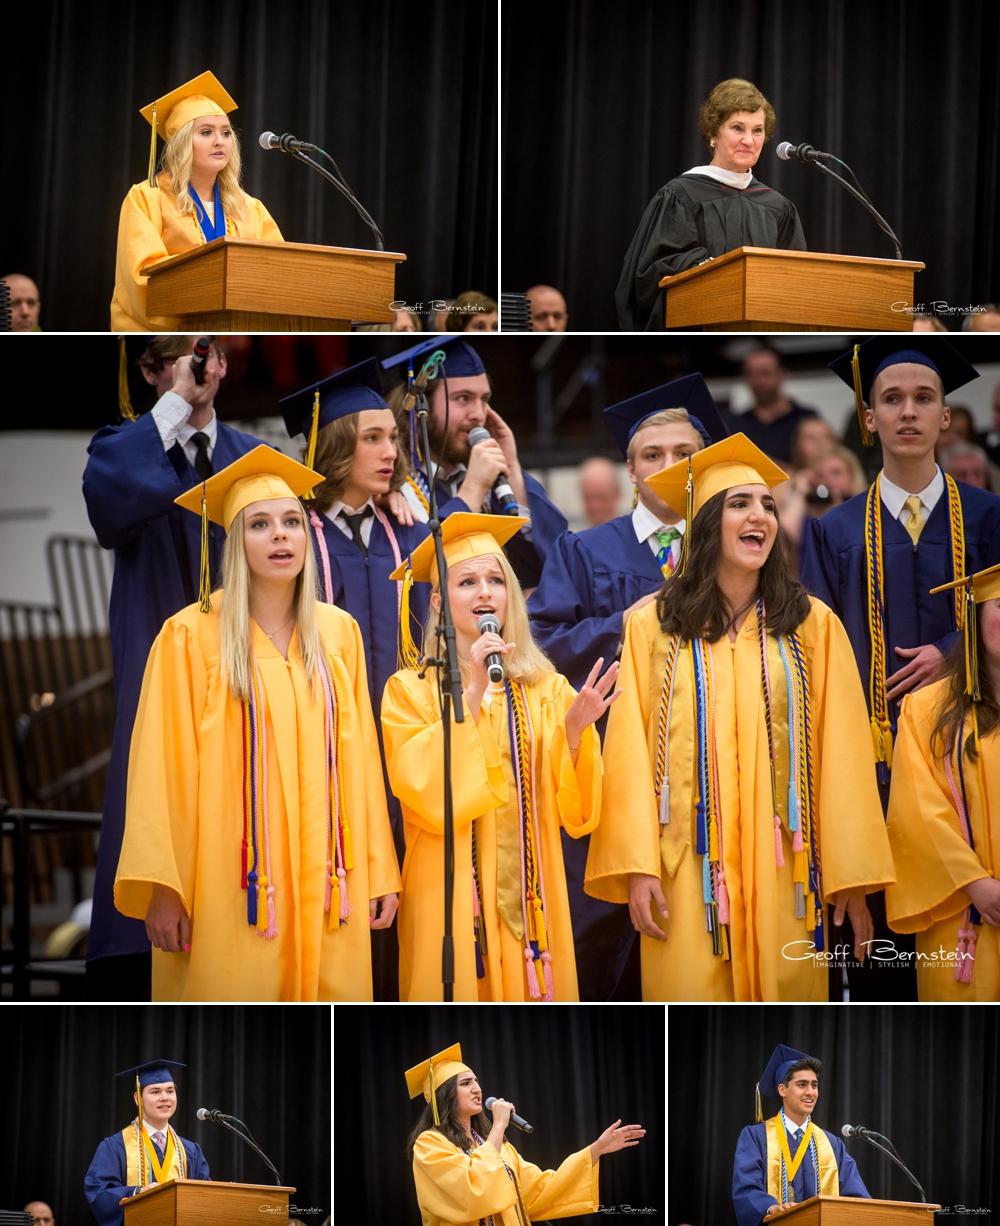 2017 SPHS Grad Collage 6.jpg